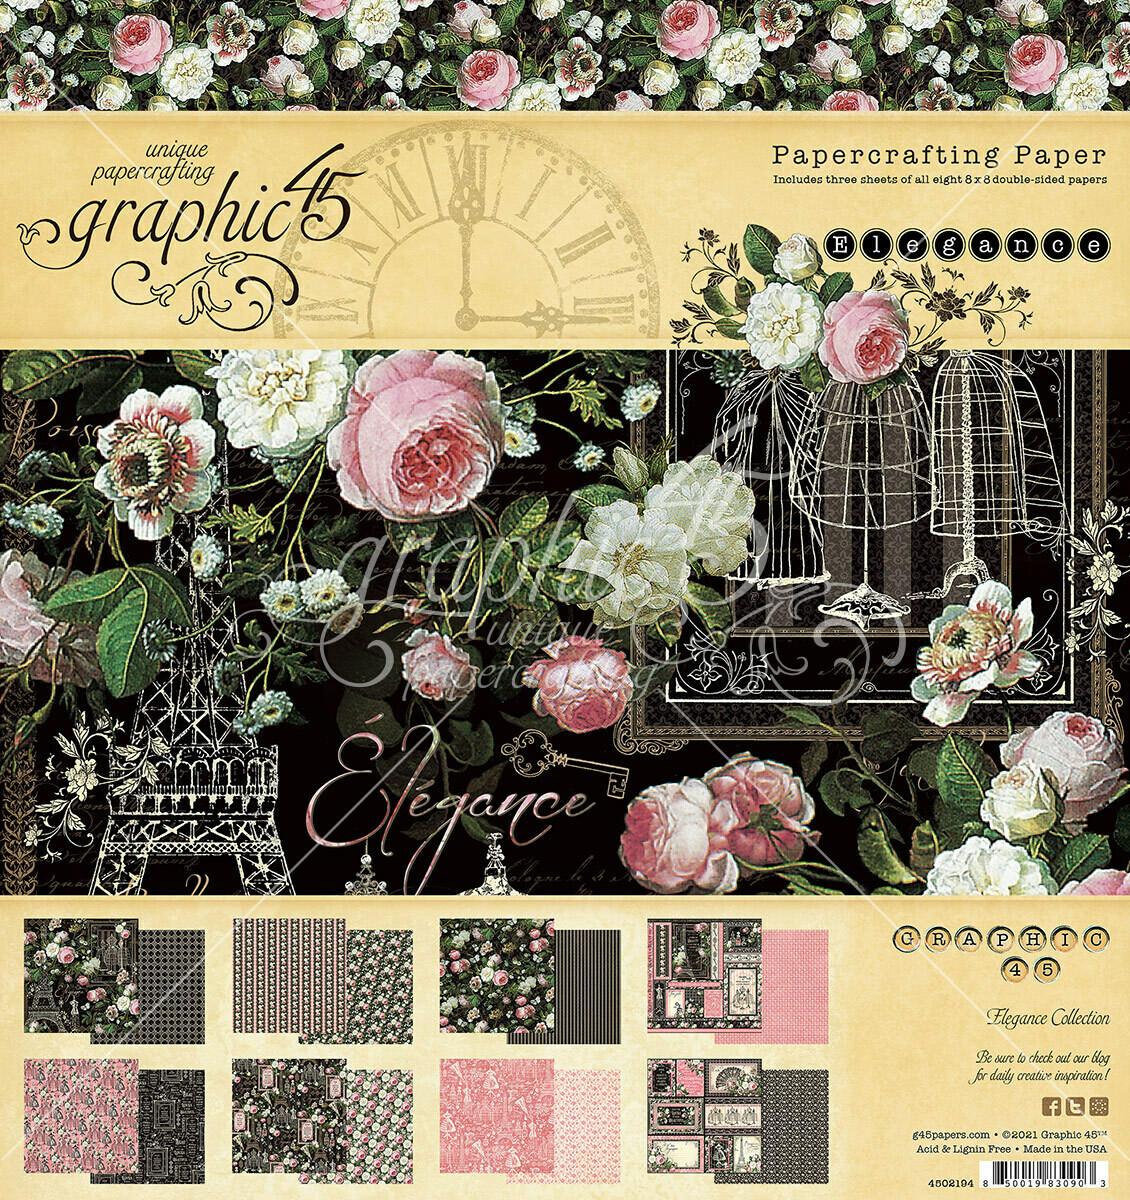 Elegance 8x8 Paper Pad - Graphic 45